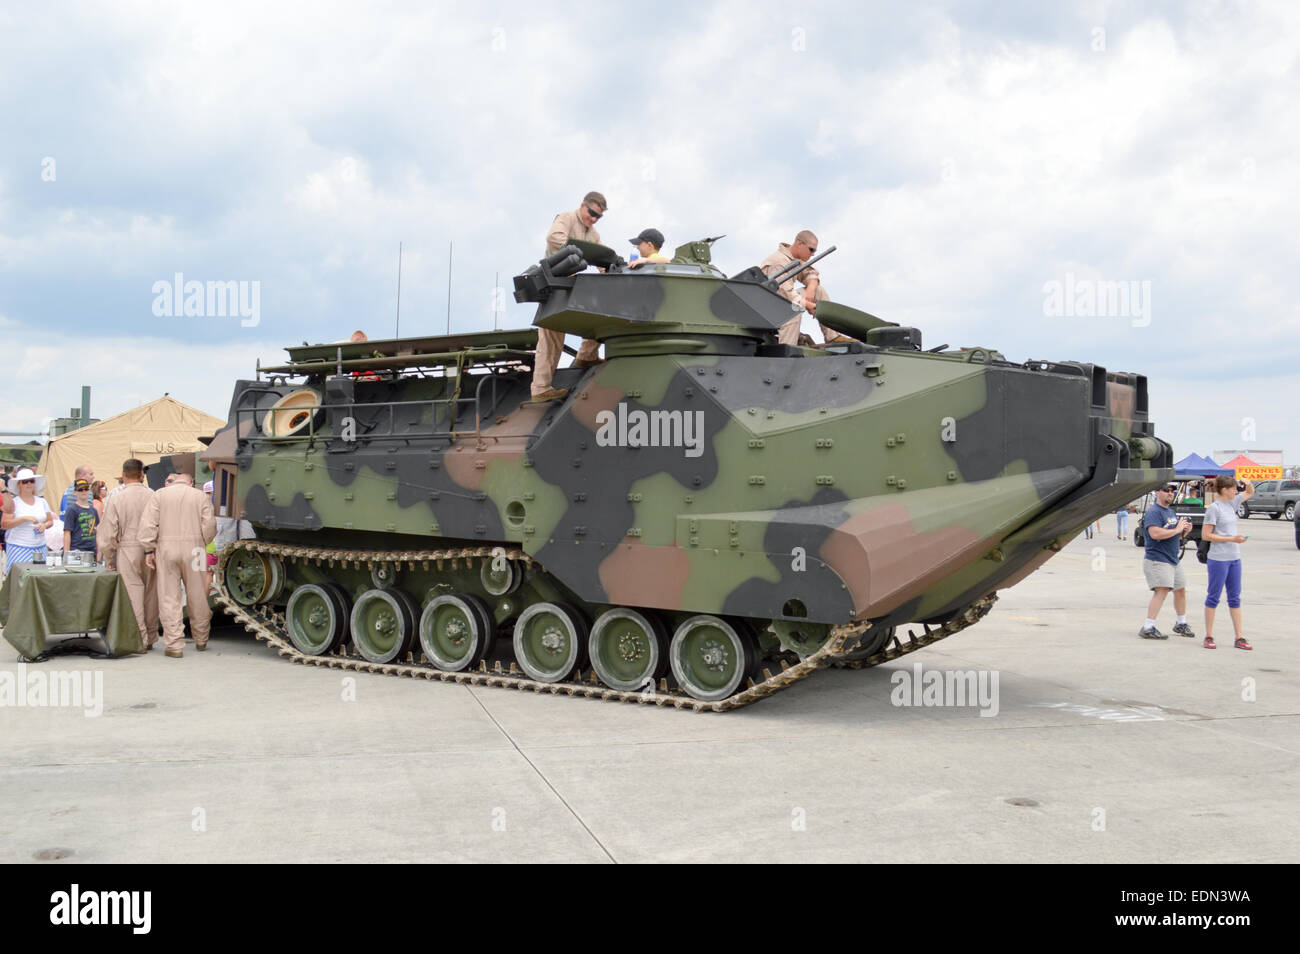 A AAV-7 armored amphibious assault vehicle. Stock Photo